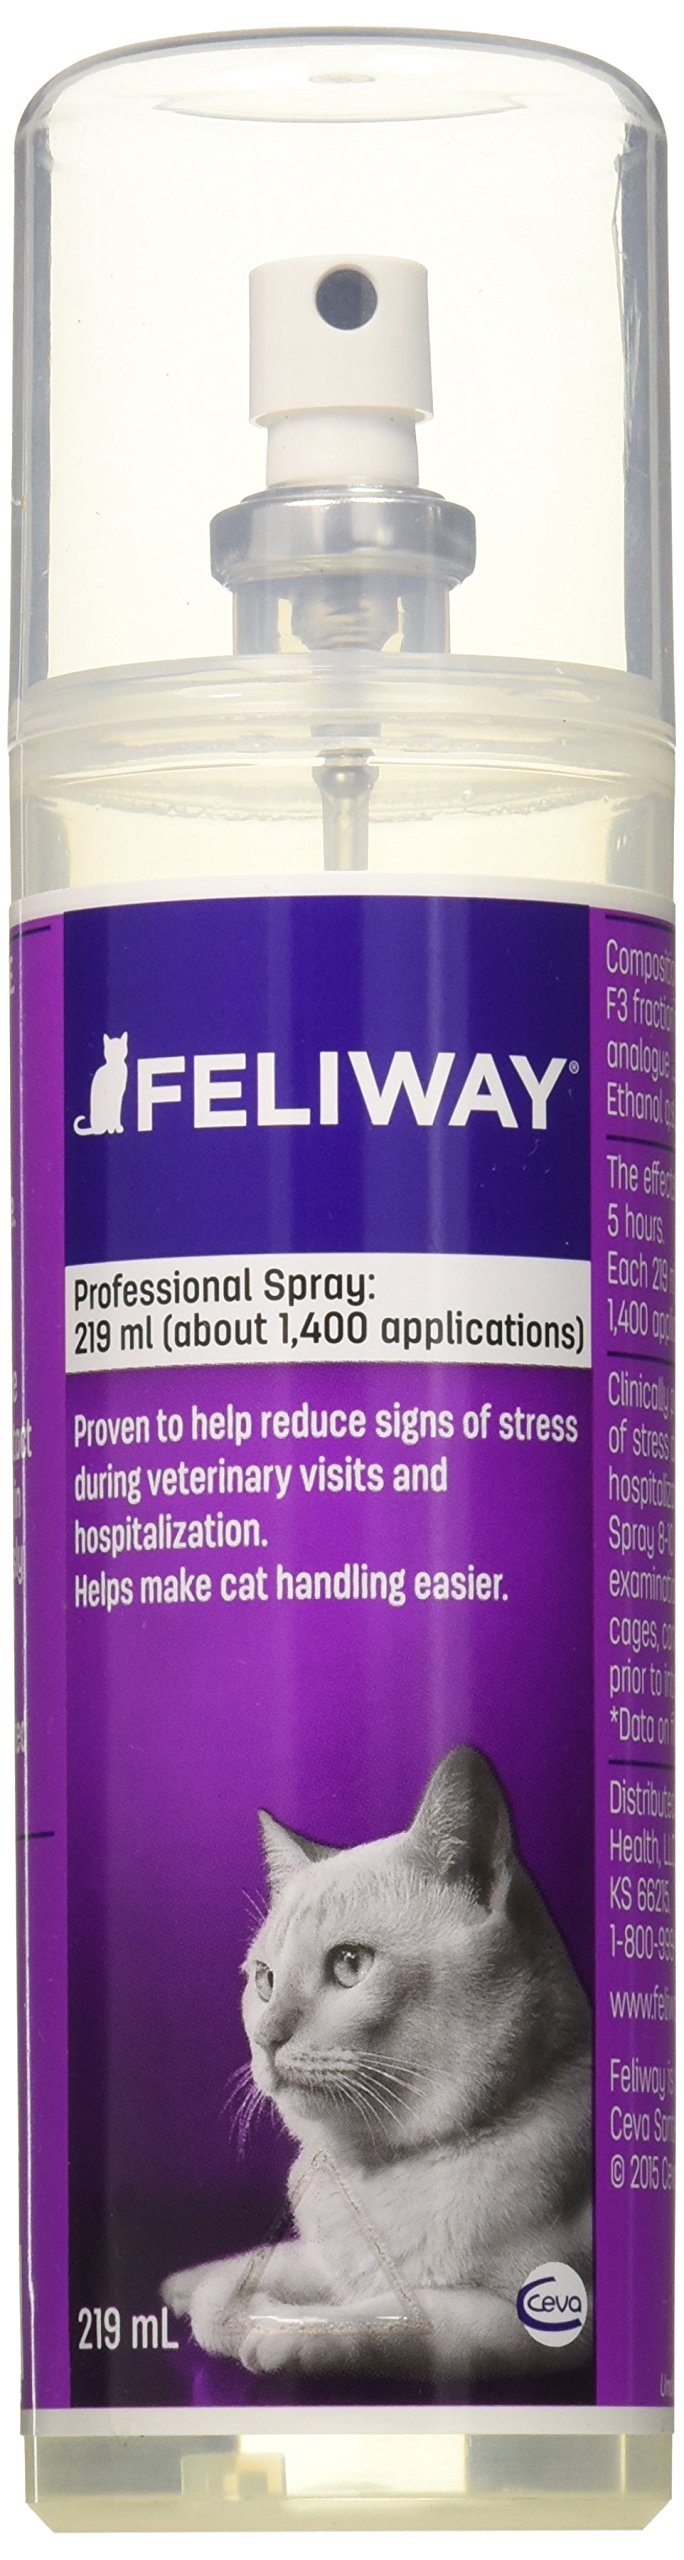 CEVA Animal Health 281020B 219ml Feliway Professional Spray, All sizes